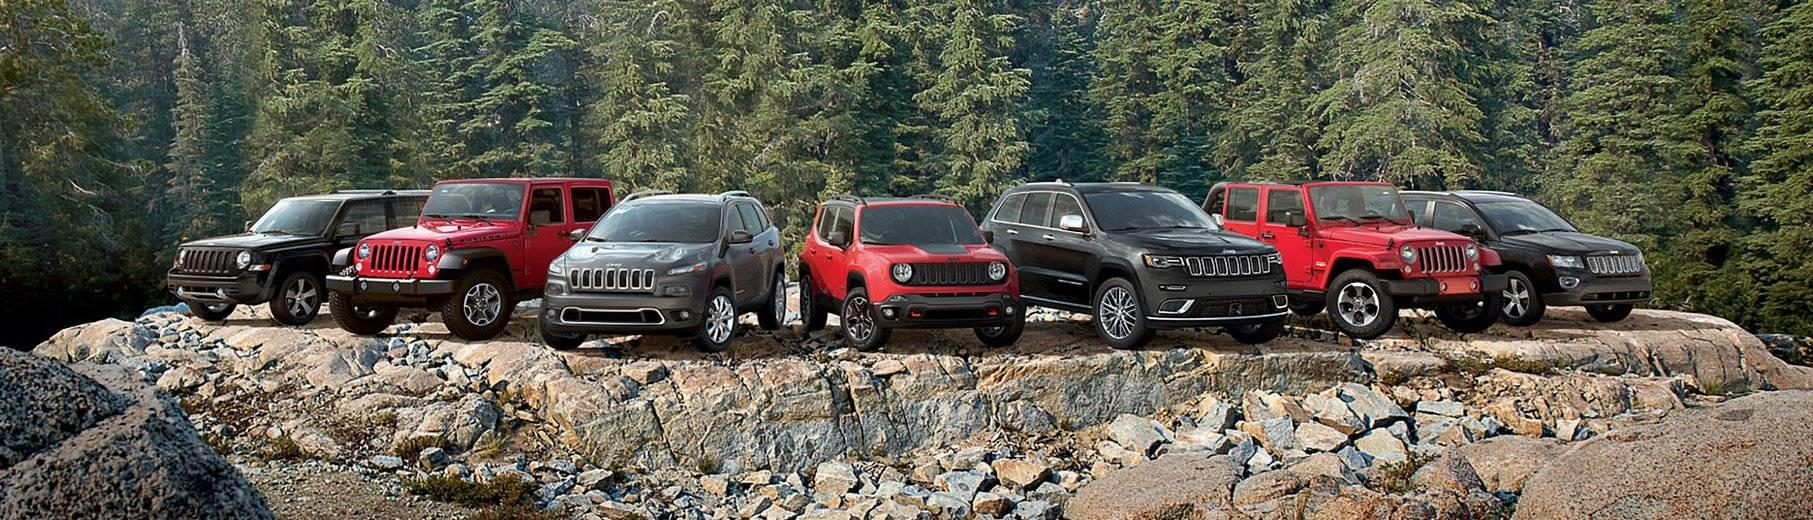 2017 Jeep Models - Wrangler Unlimited, Wrangler, Cherokee, Grand Cherokee, Compass, Renegade, Patriot